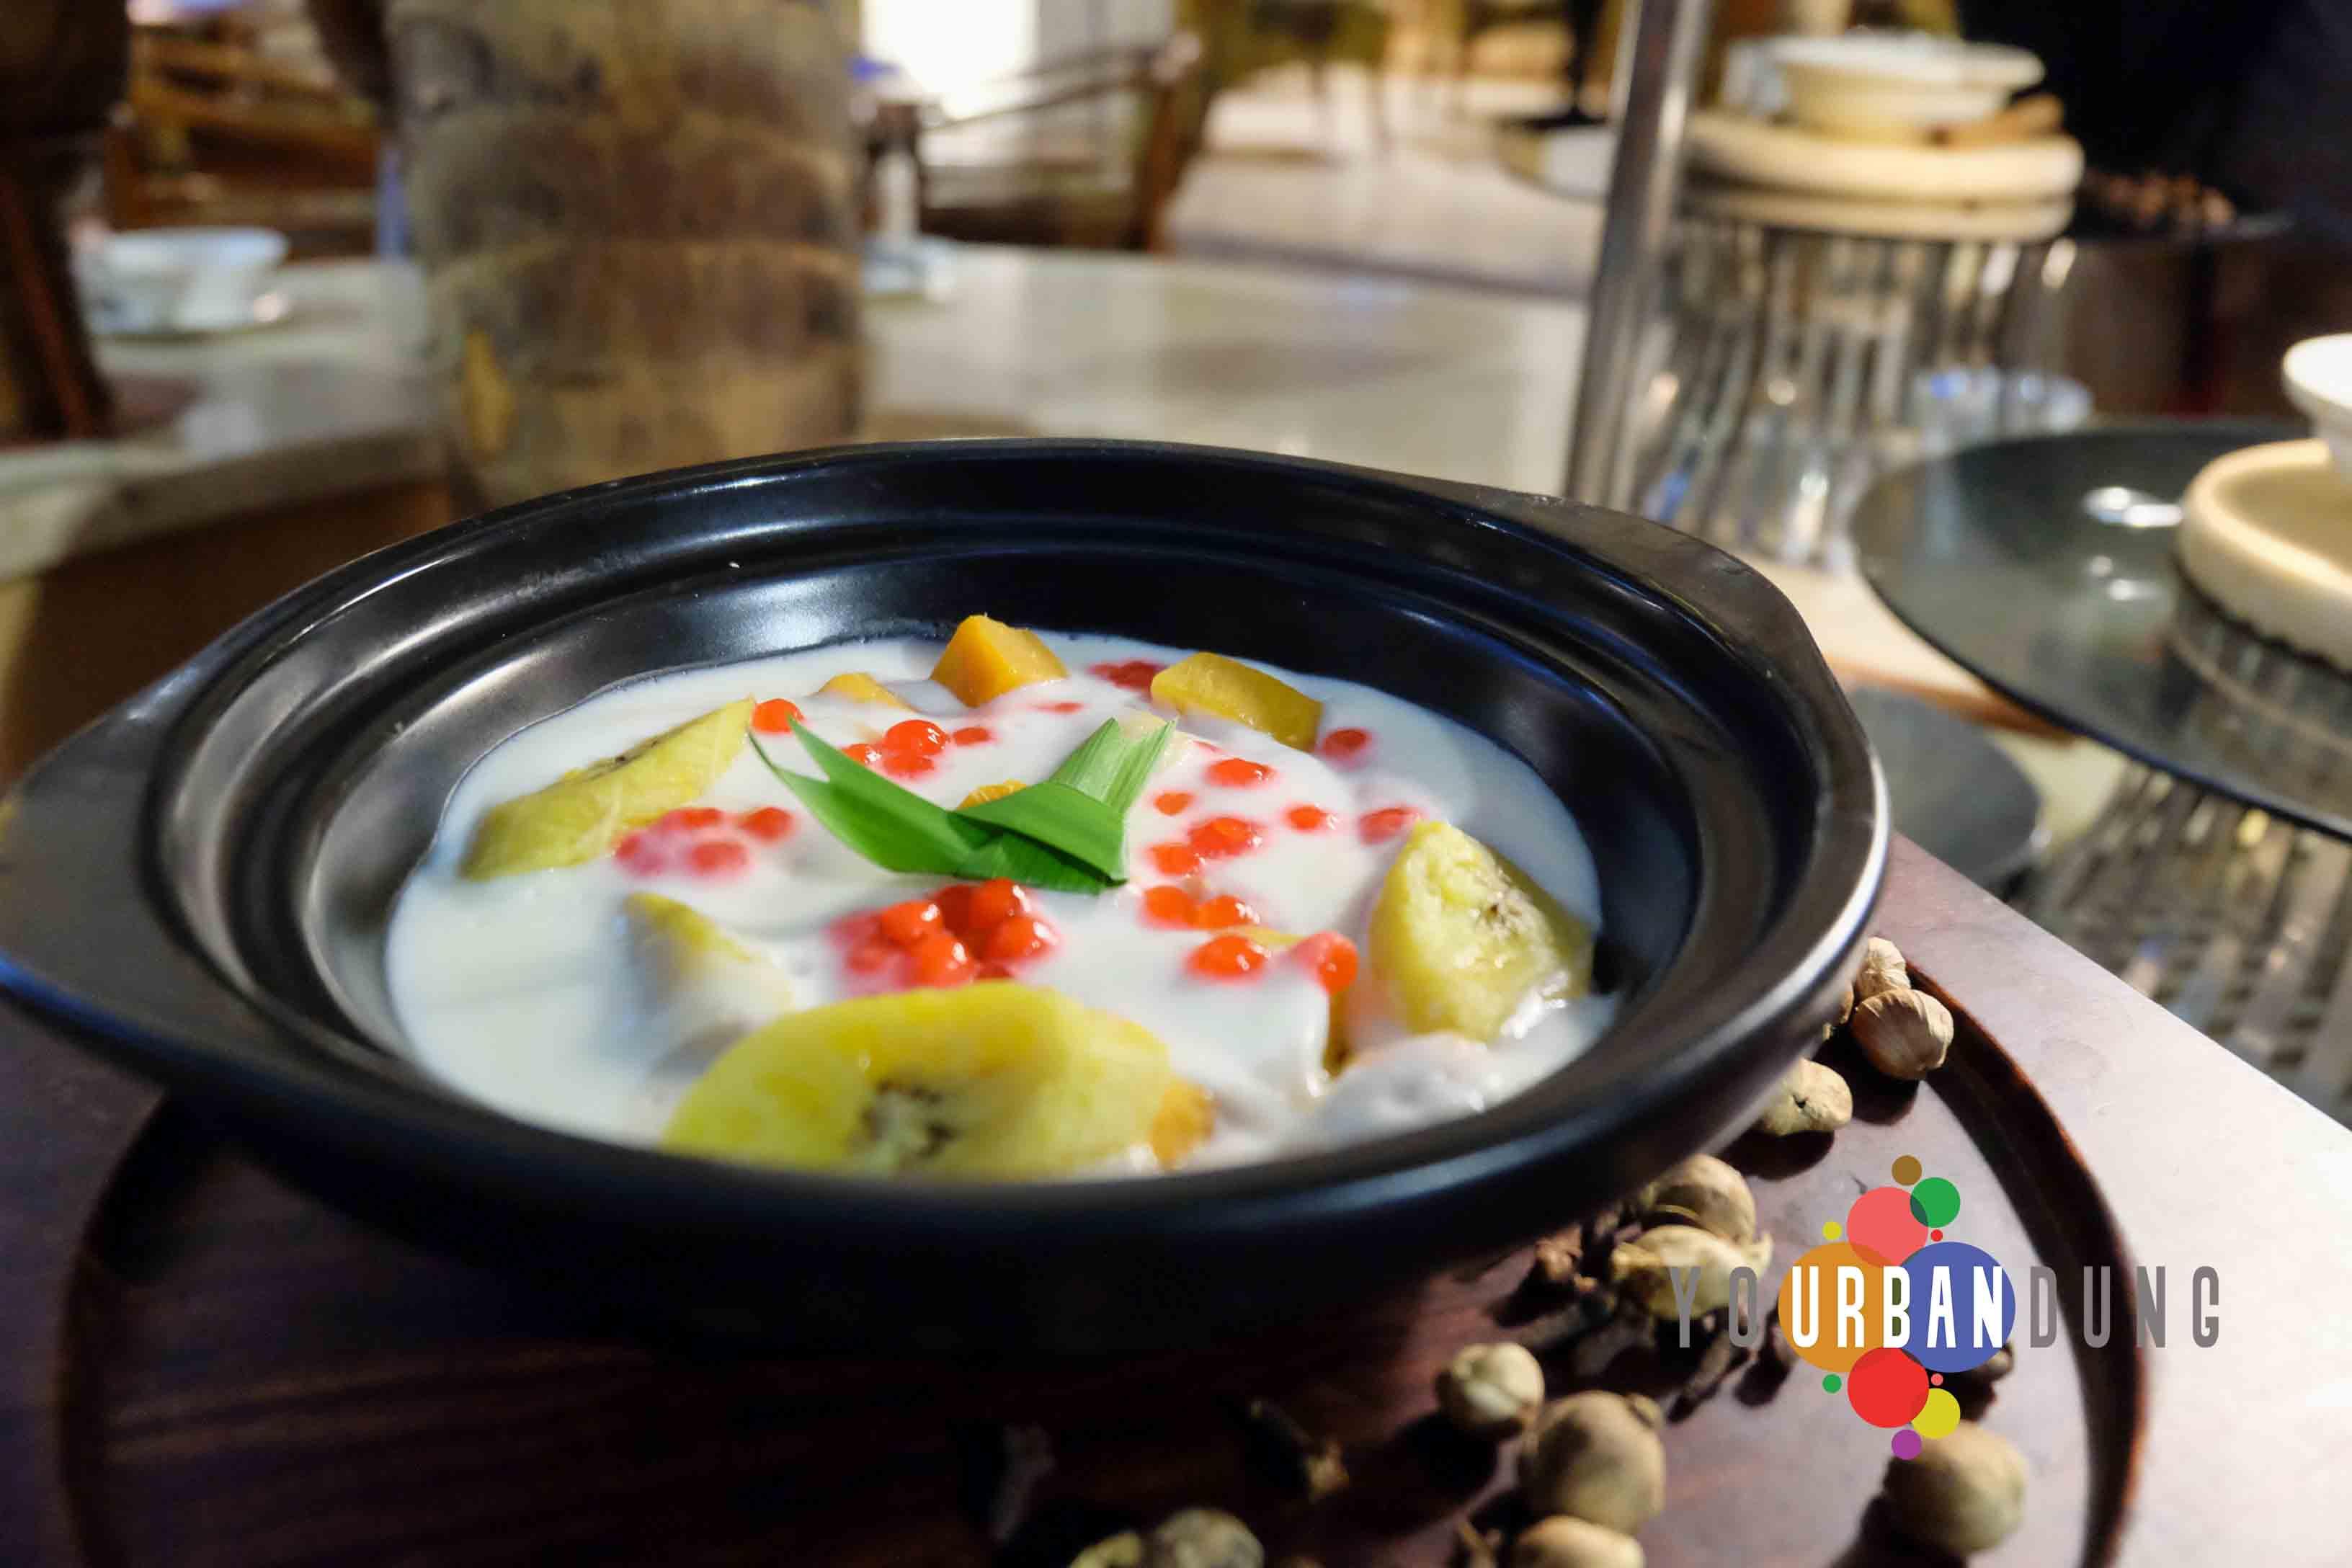 Daftar Paket Buka Puasa Bersama Hotel Di Bandung Tahun 2019 Your